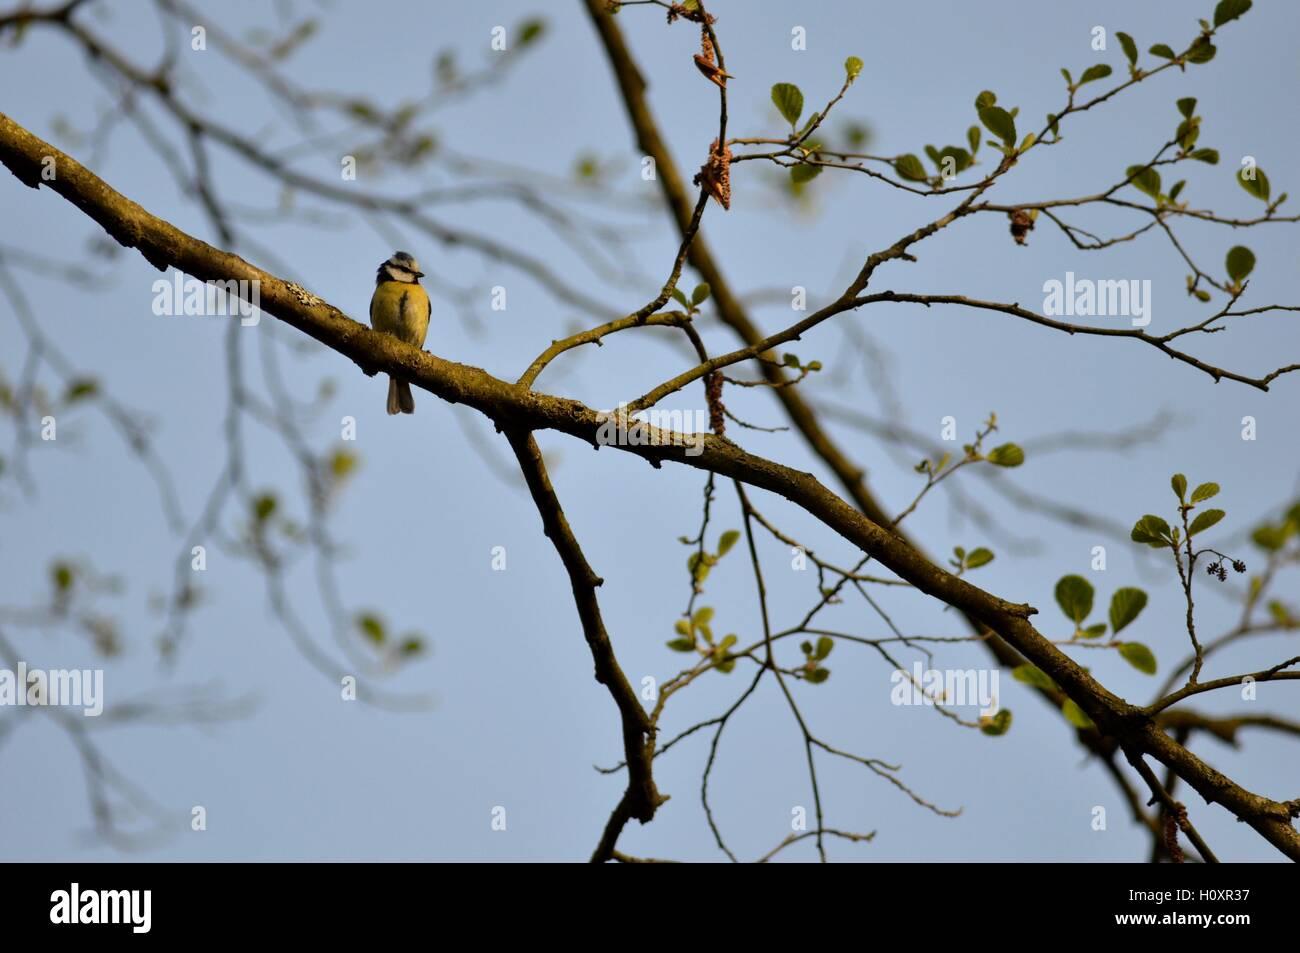 Bird in tree - Stock Image